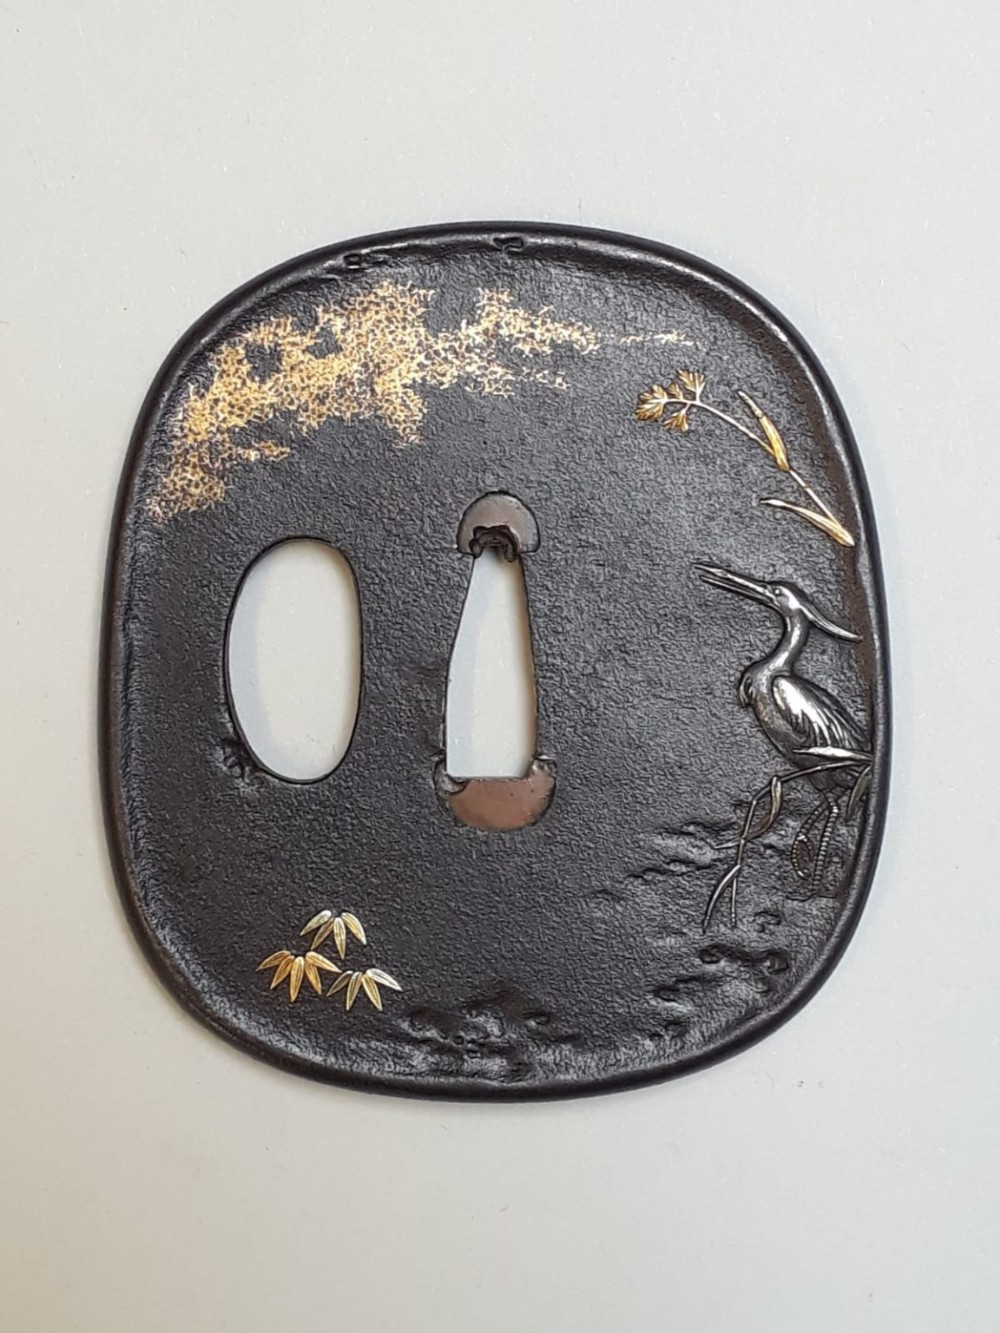 japanese meiji period iron tsuba with a fishing egret